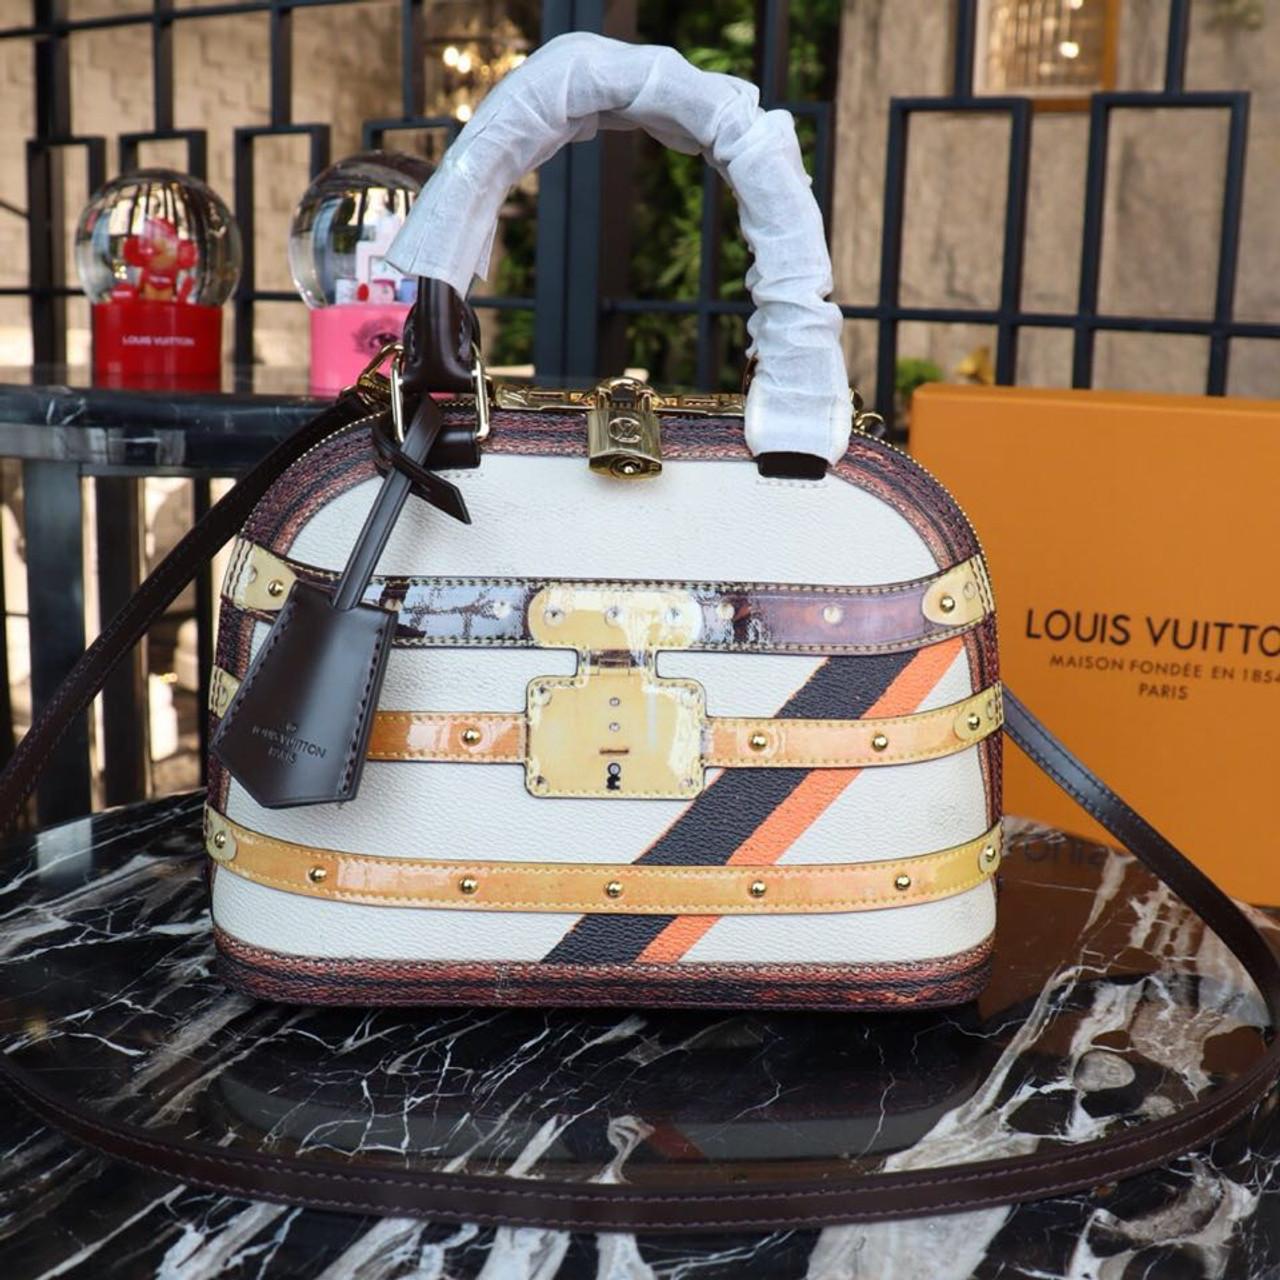 7d9f342ccc6 Louis Vuitton Alma BB Time Trunk Bag Monogram Vernis Canvas Spring Summer  2019 Collection M44389